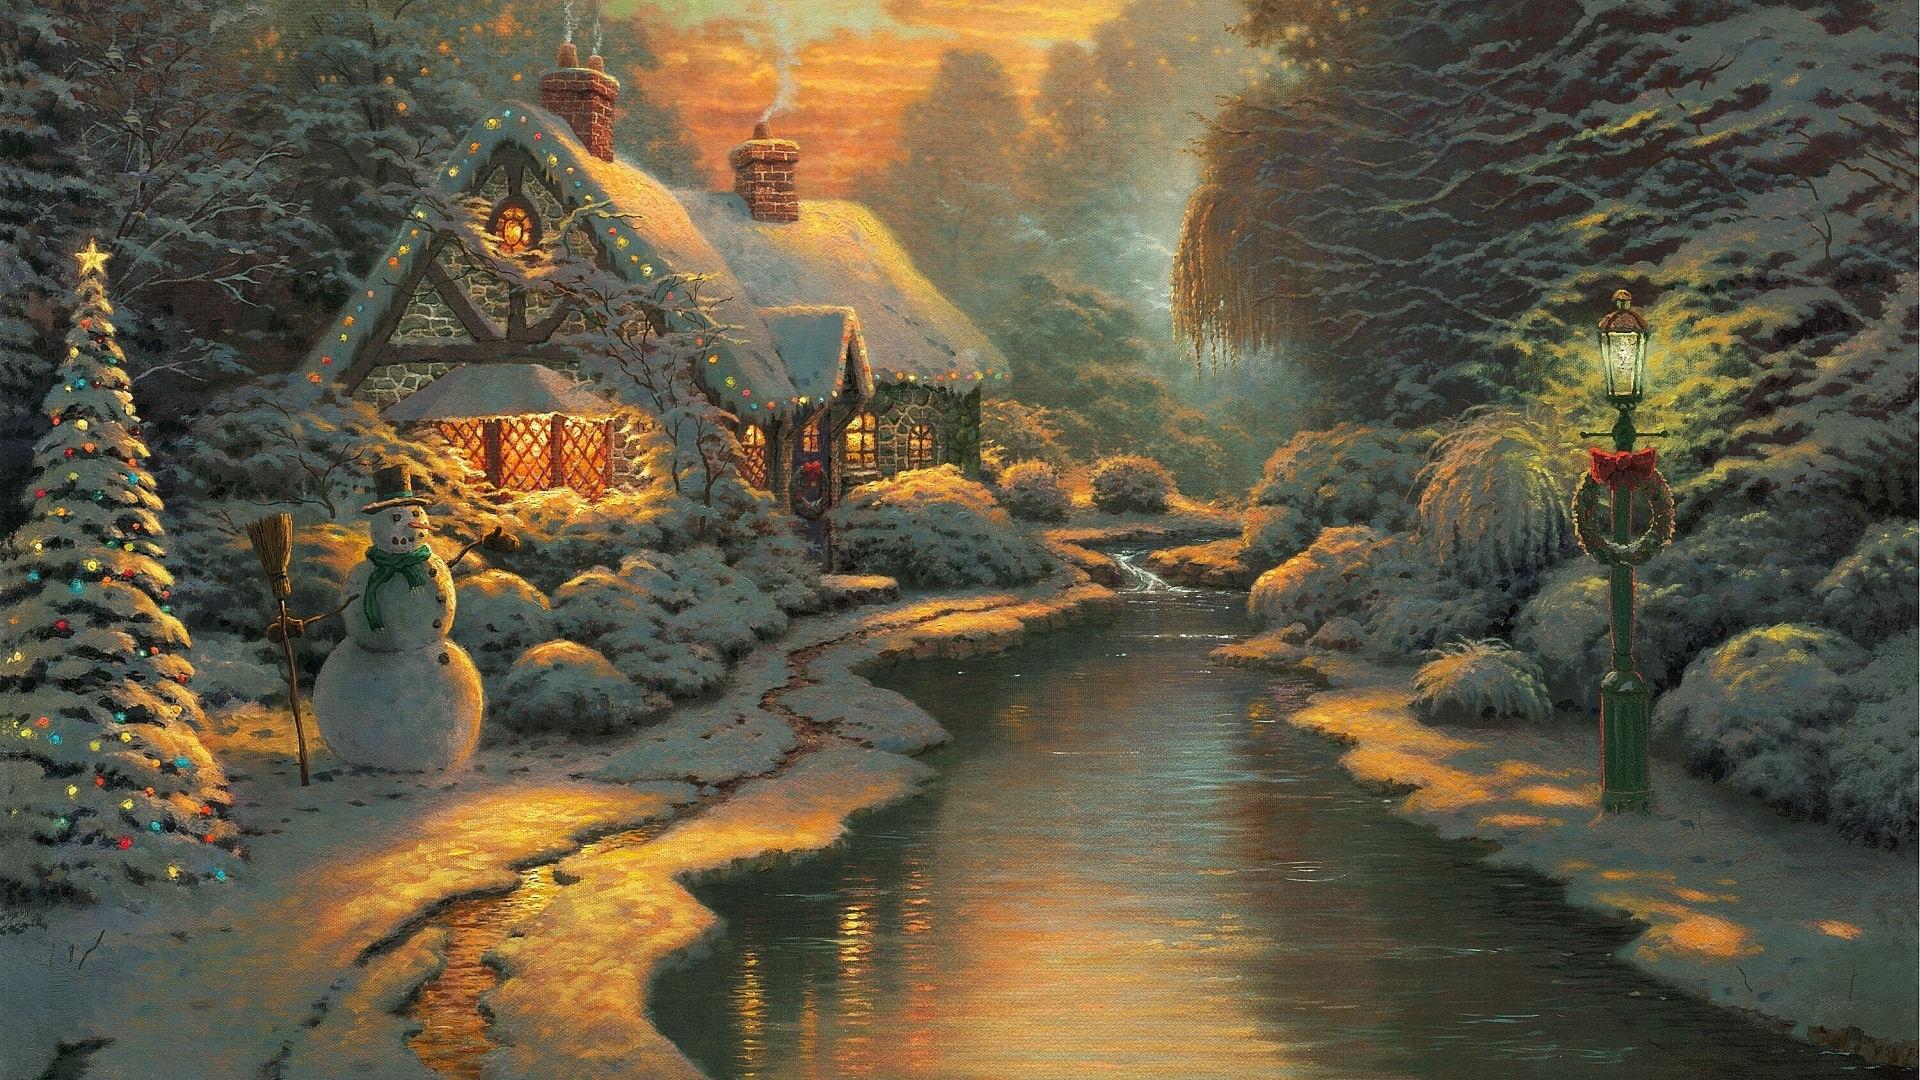 download wallpaper: Kersttafereel wallpaper